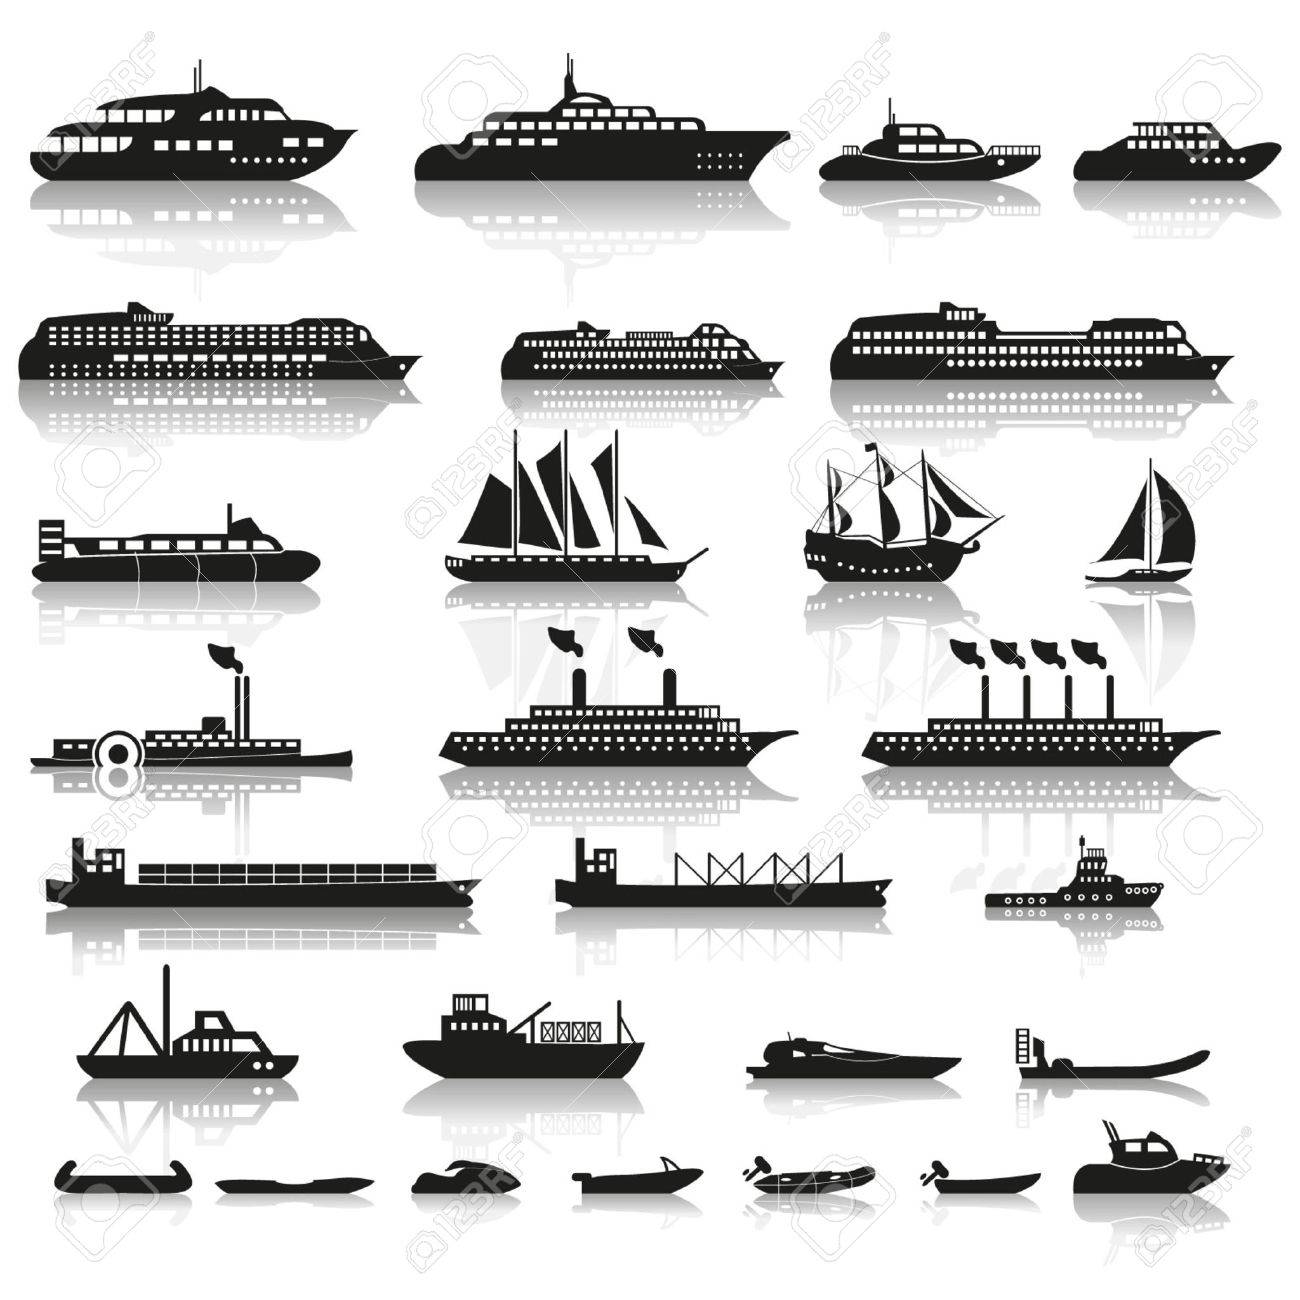 Set of ships and boats - 24660113